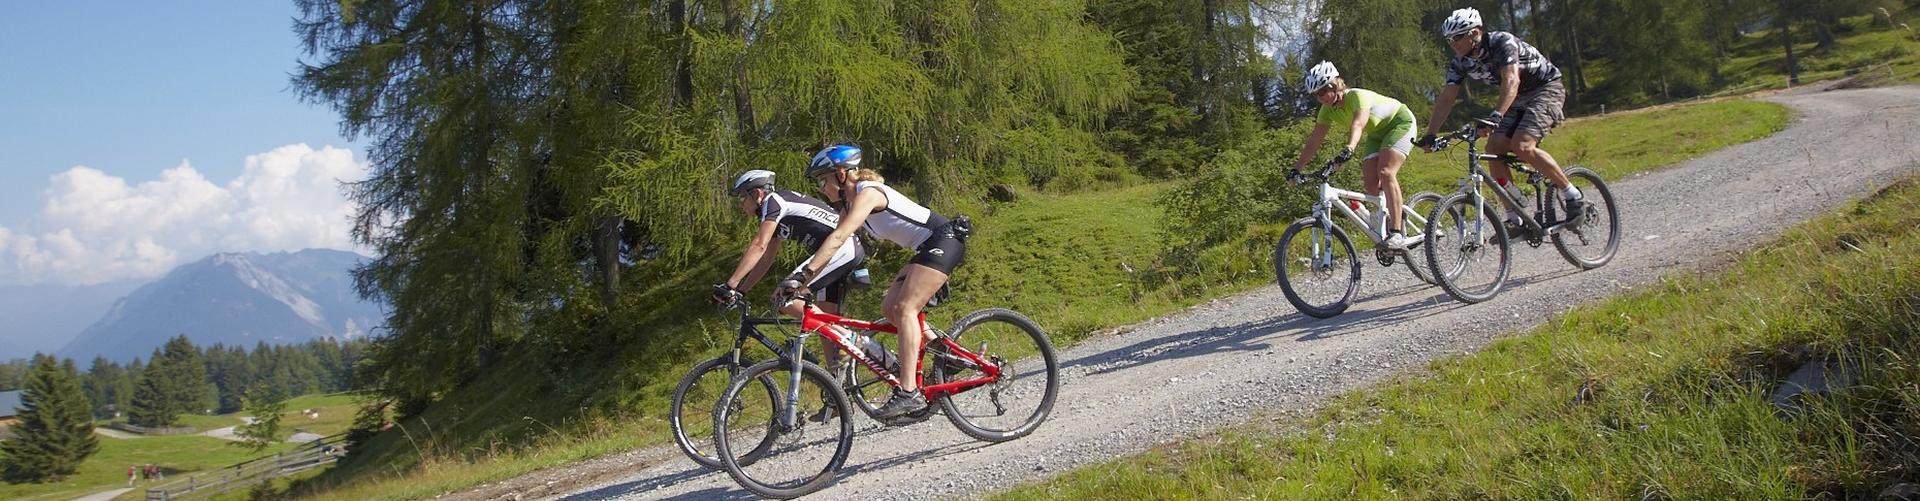 Mountainbiking im Sporturlaub